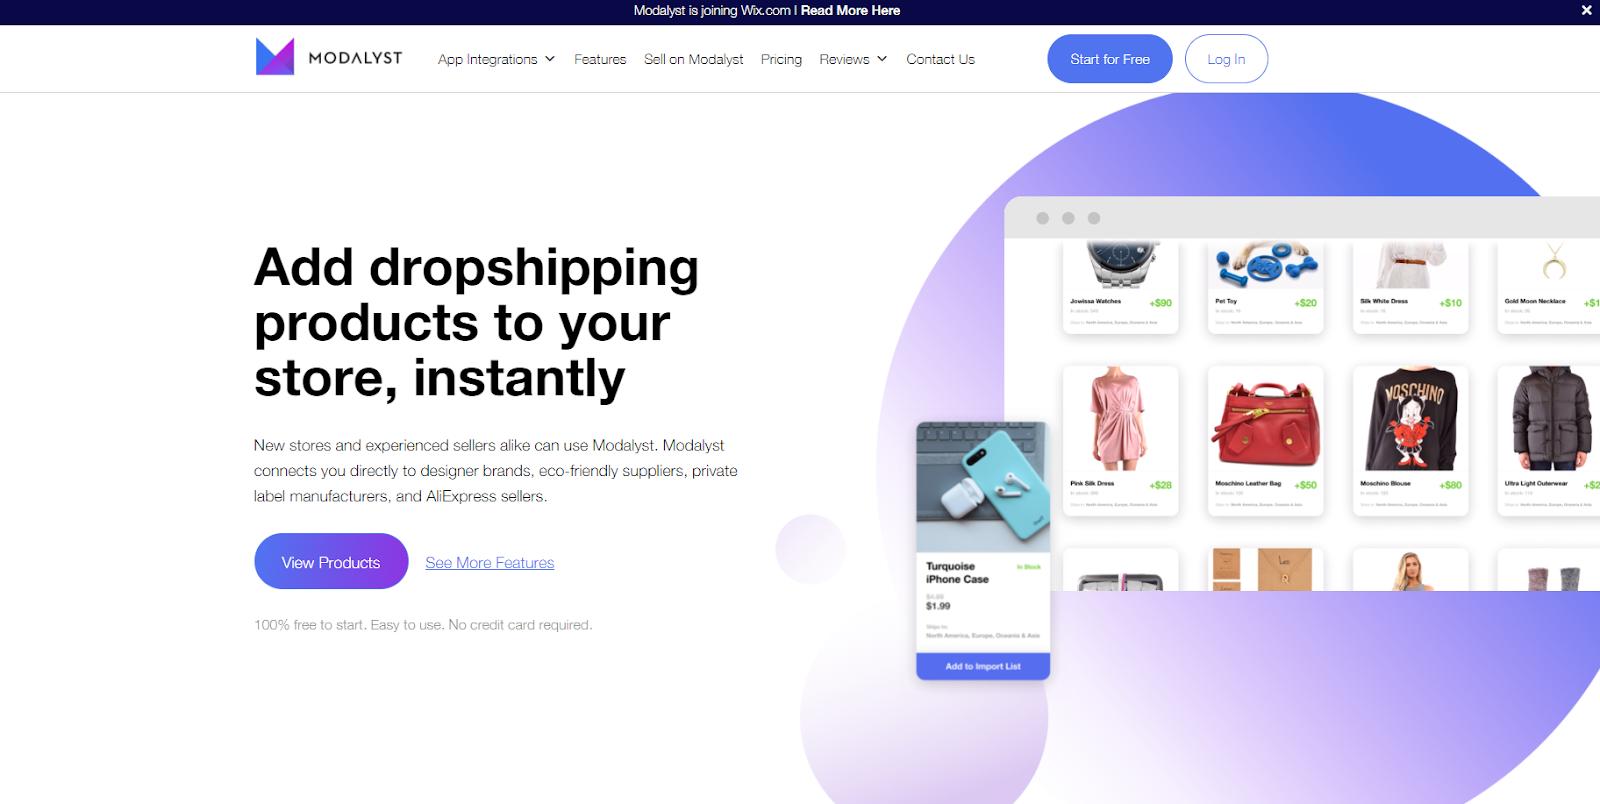 modalyst dropshipping app